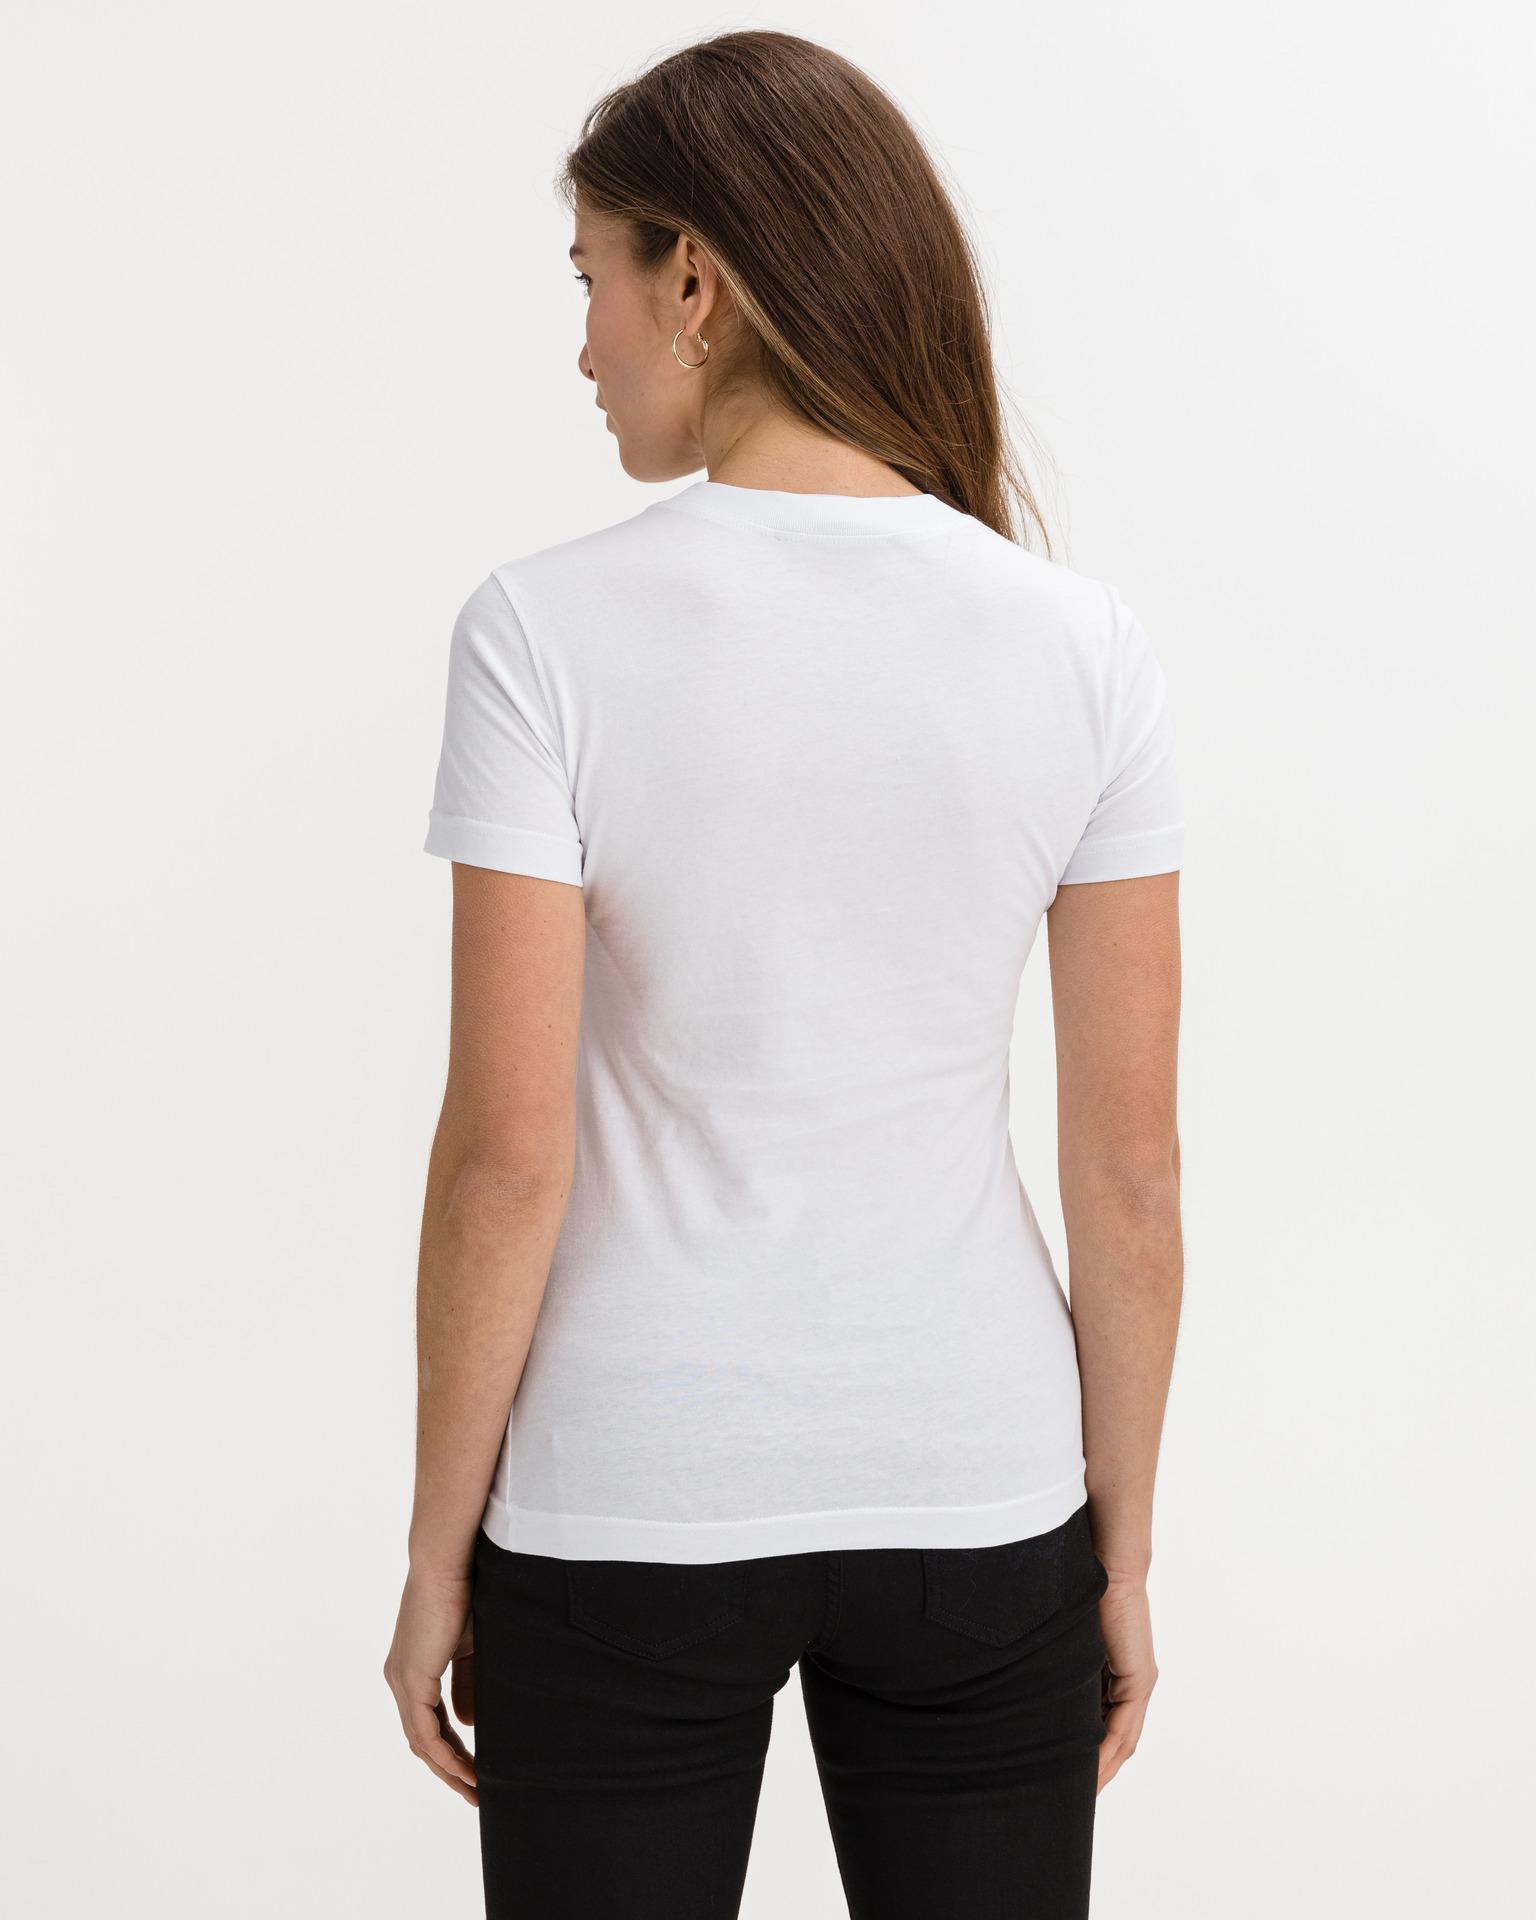 Versace Jeans Couture bianco da donna maglietta